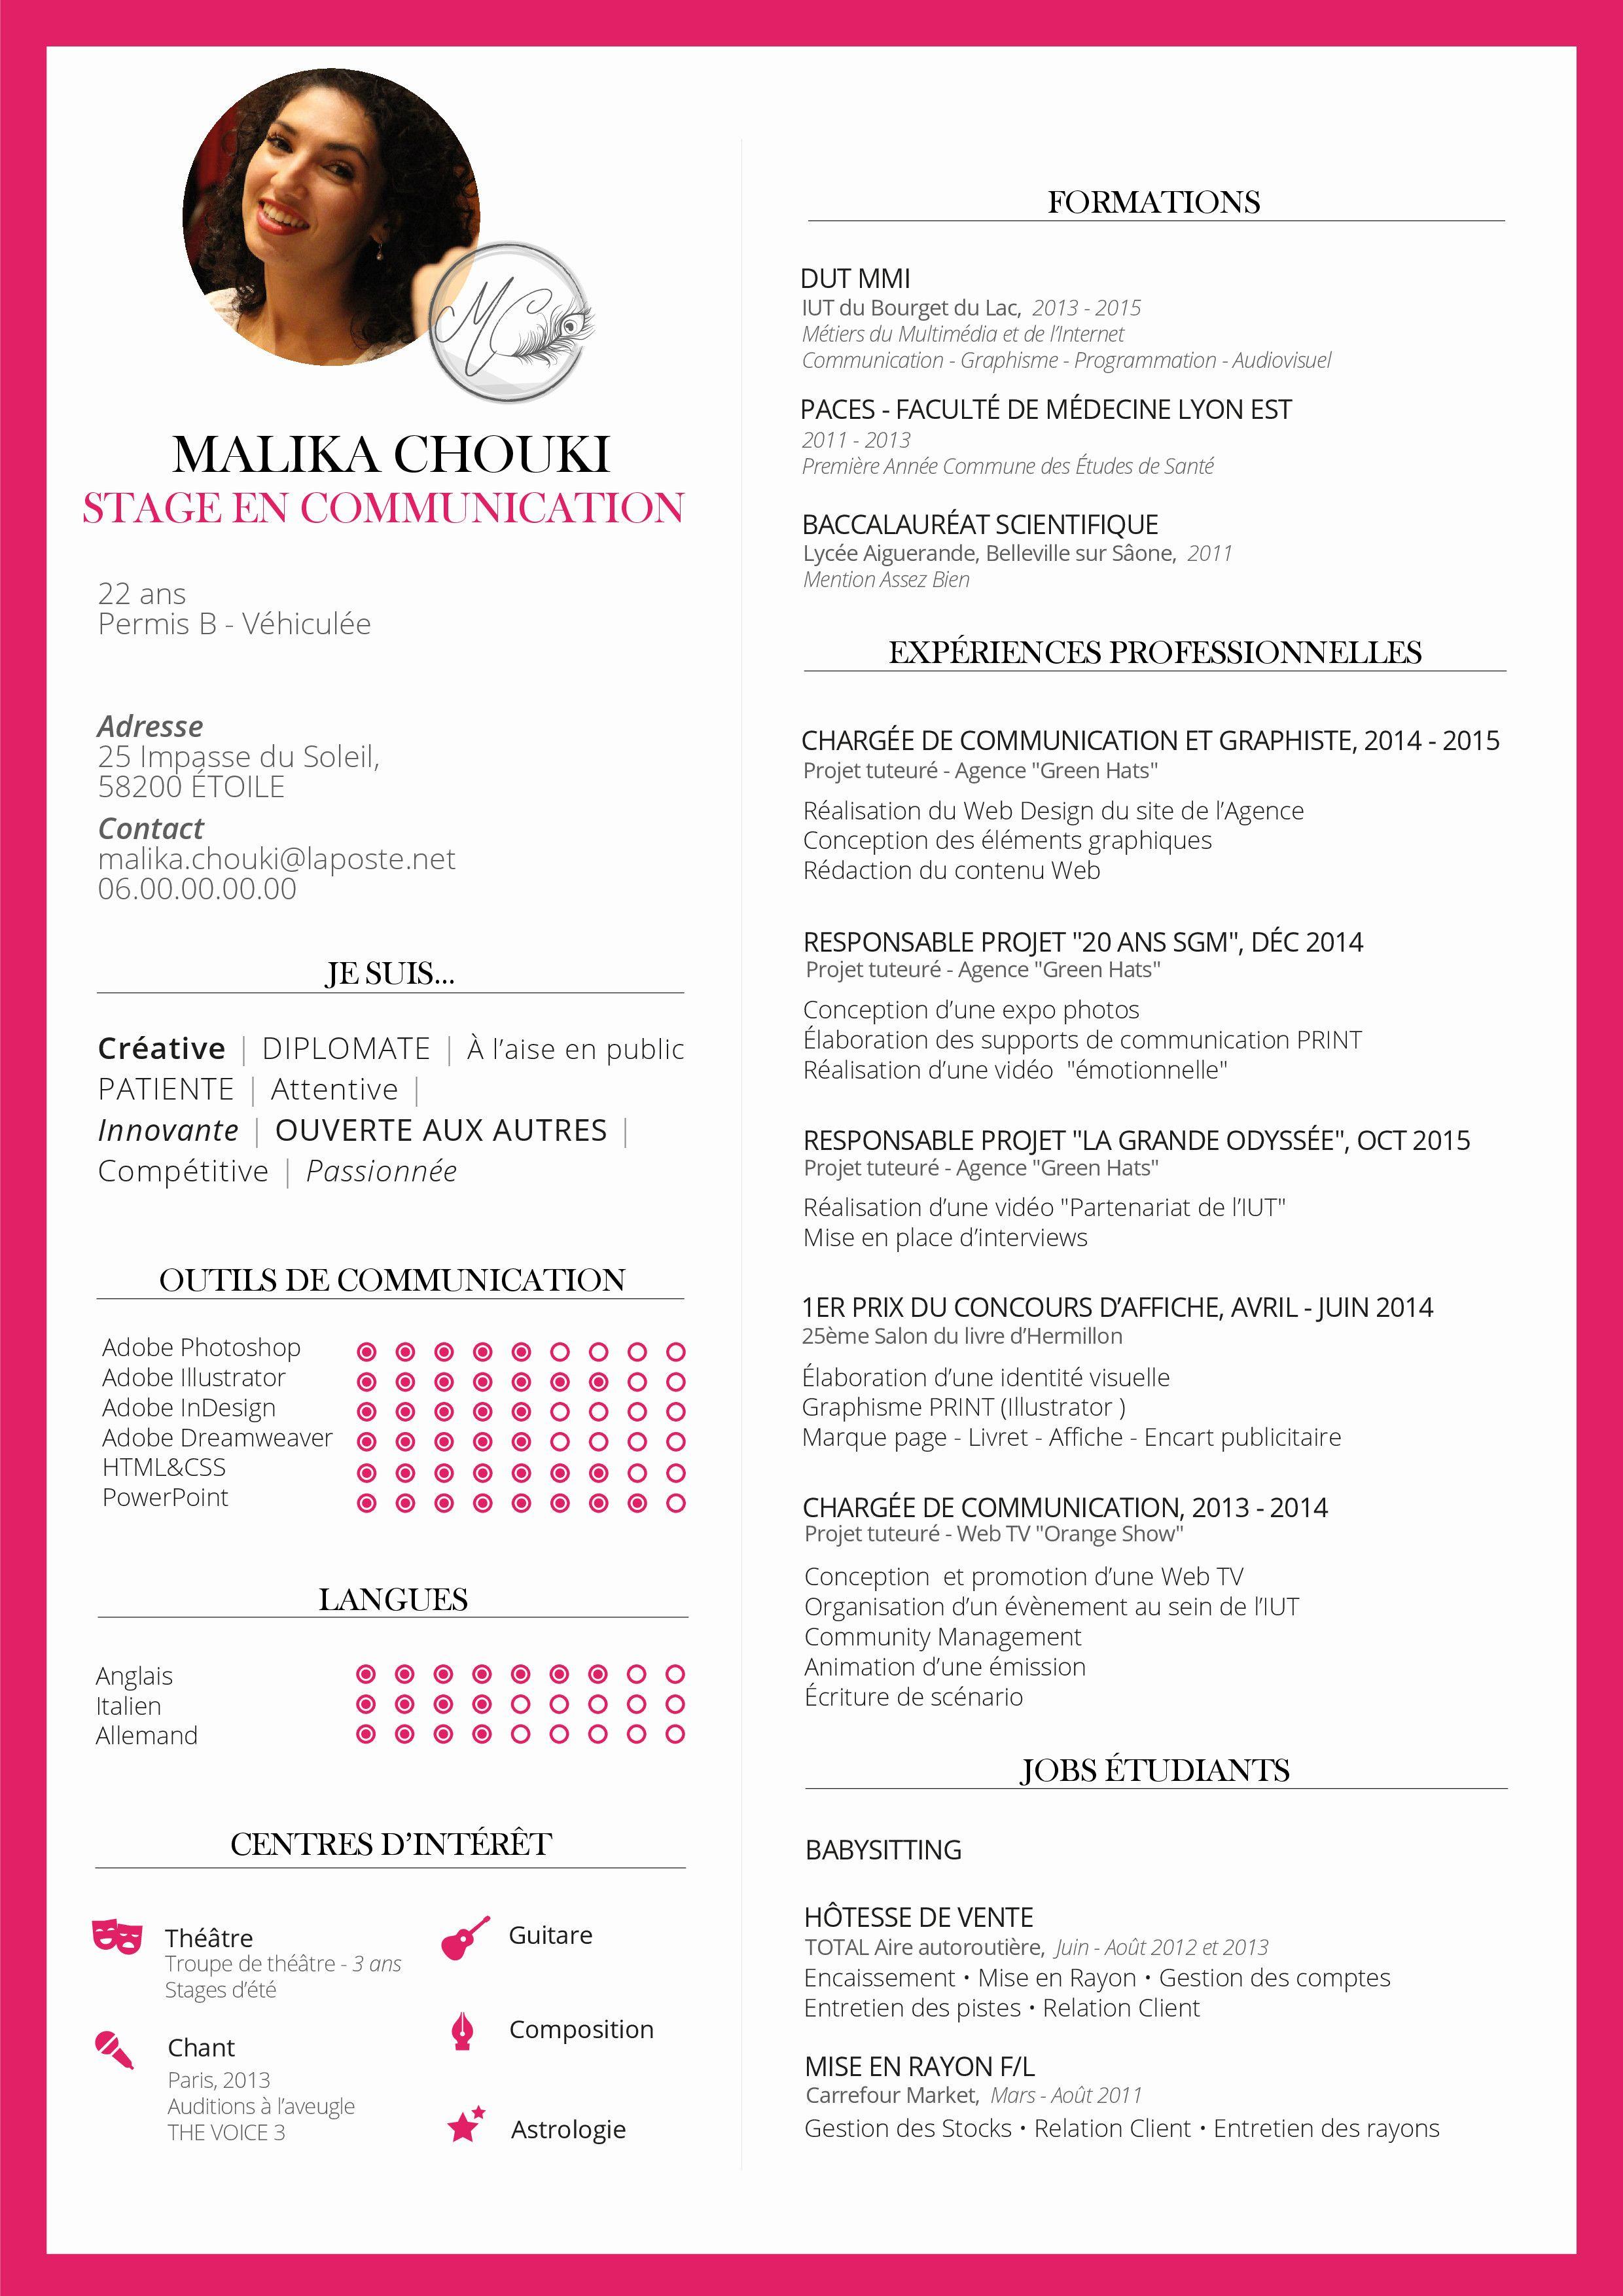 Cv Resume Pink Rose Illustrator Faculte De Medecine Medecine Permis B